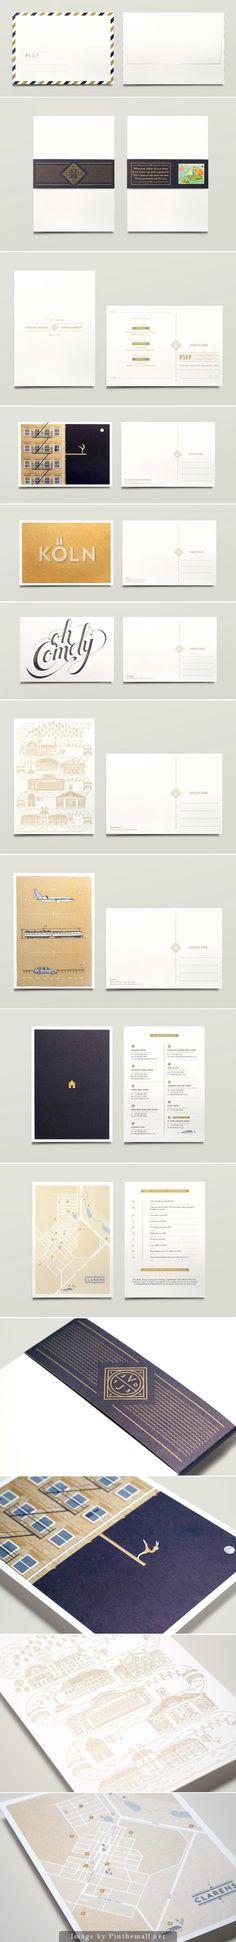 Wedding Materials | via RedBird Paperie